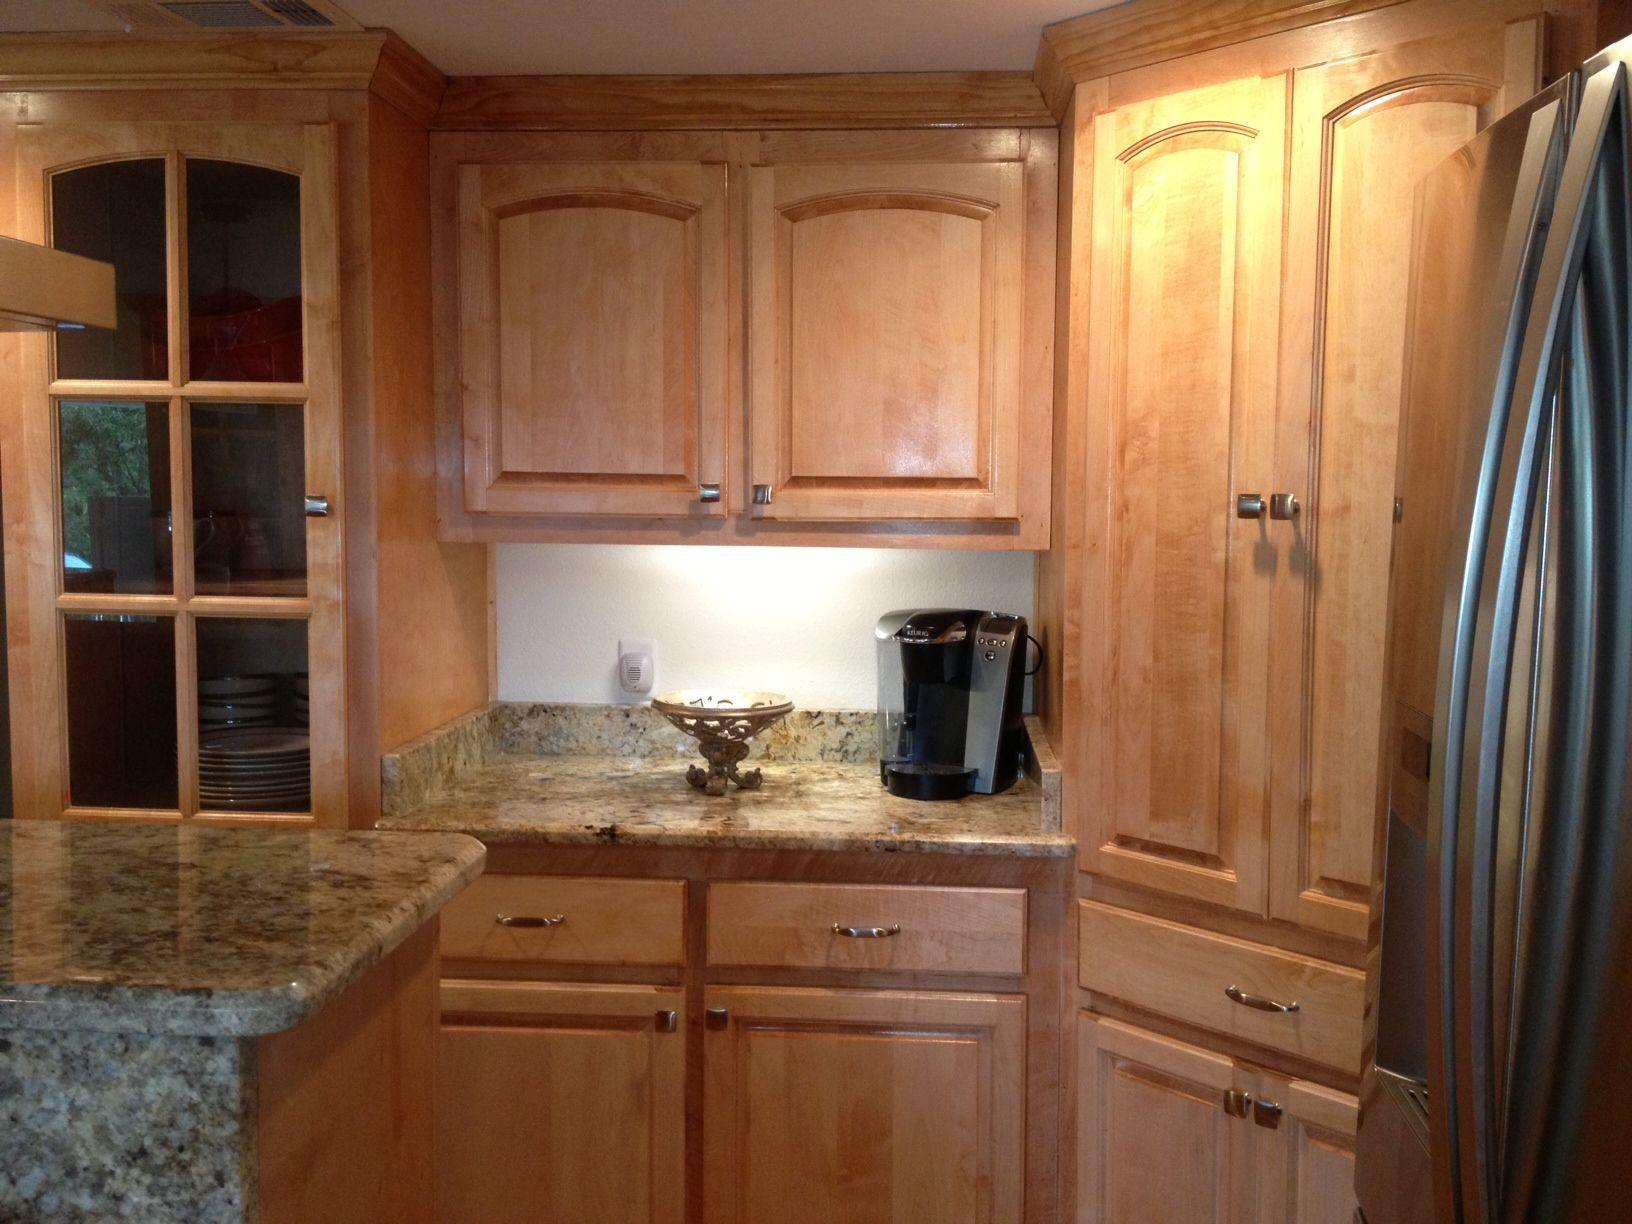 Hawaii Granite Kitchen Inspirations Kitchen Transformation Beautiful Kitchens